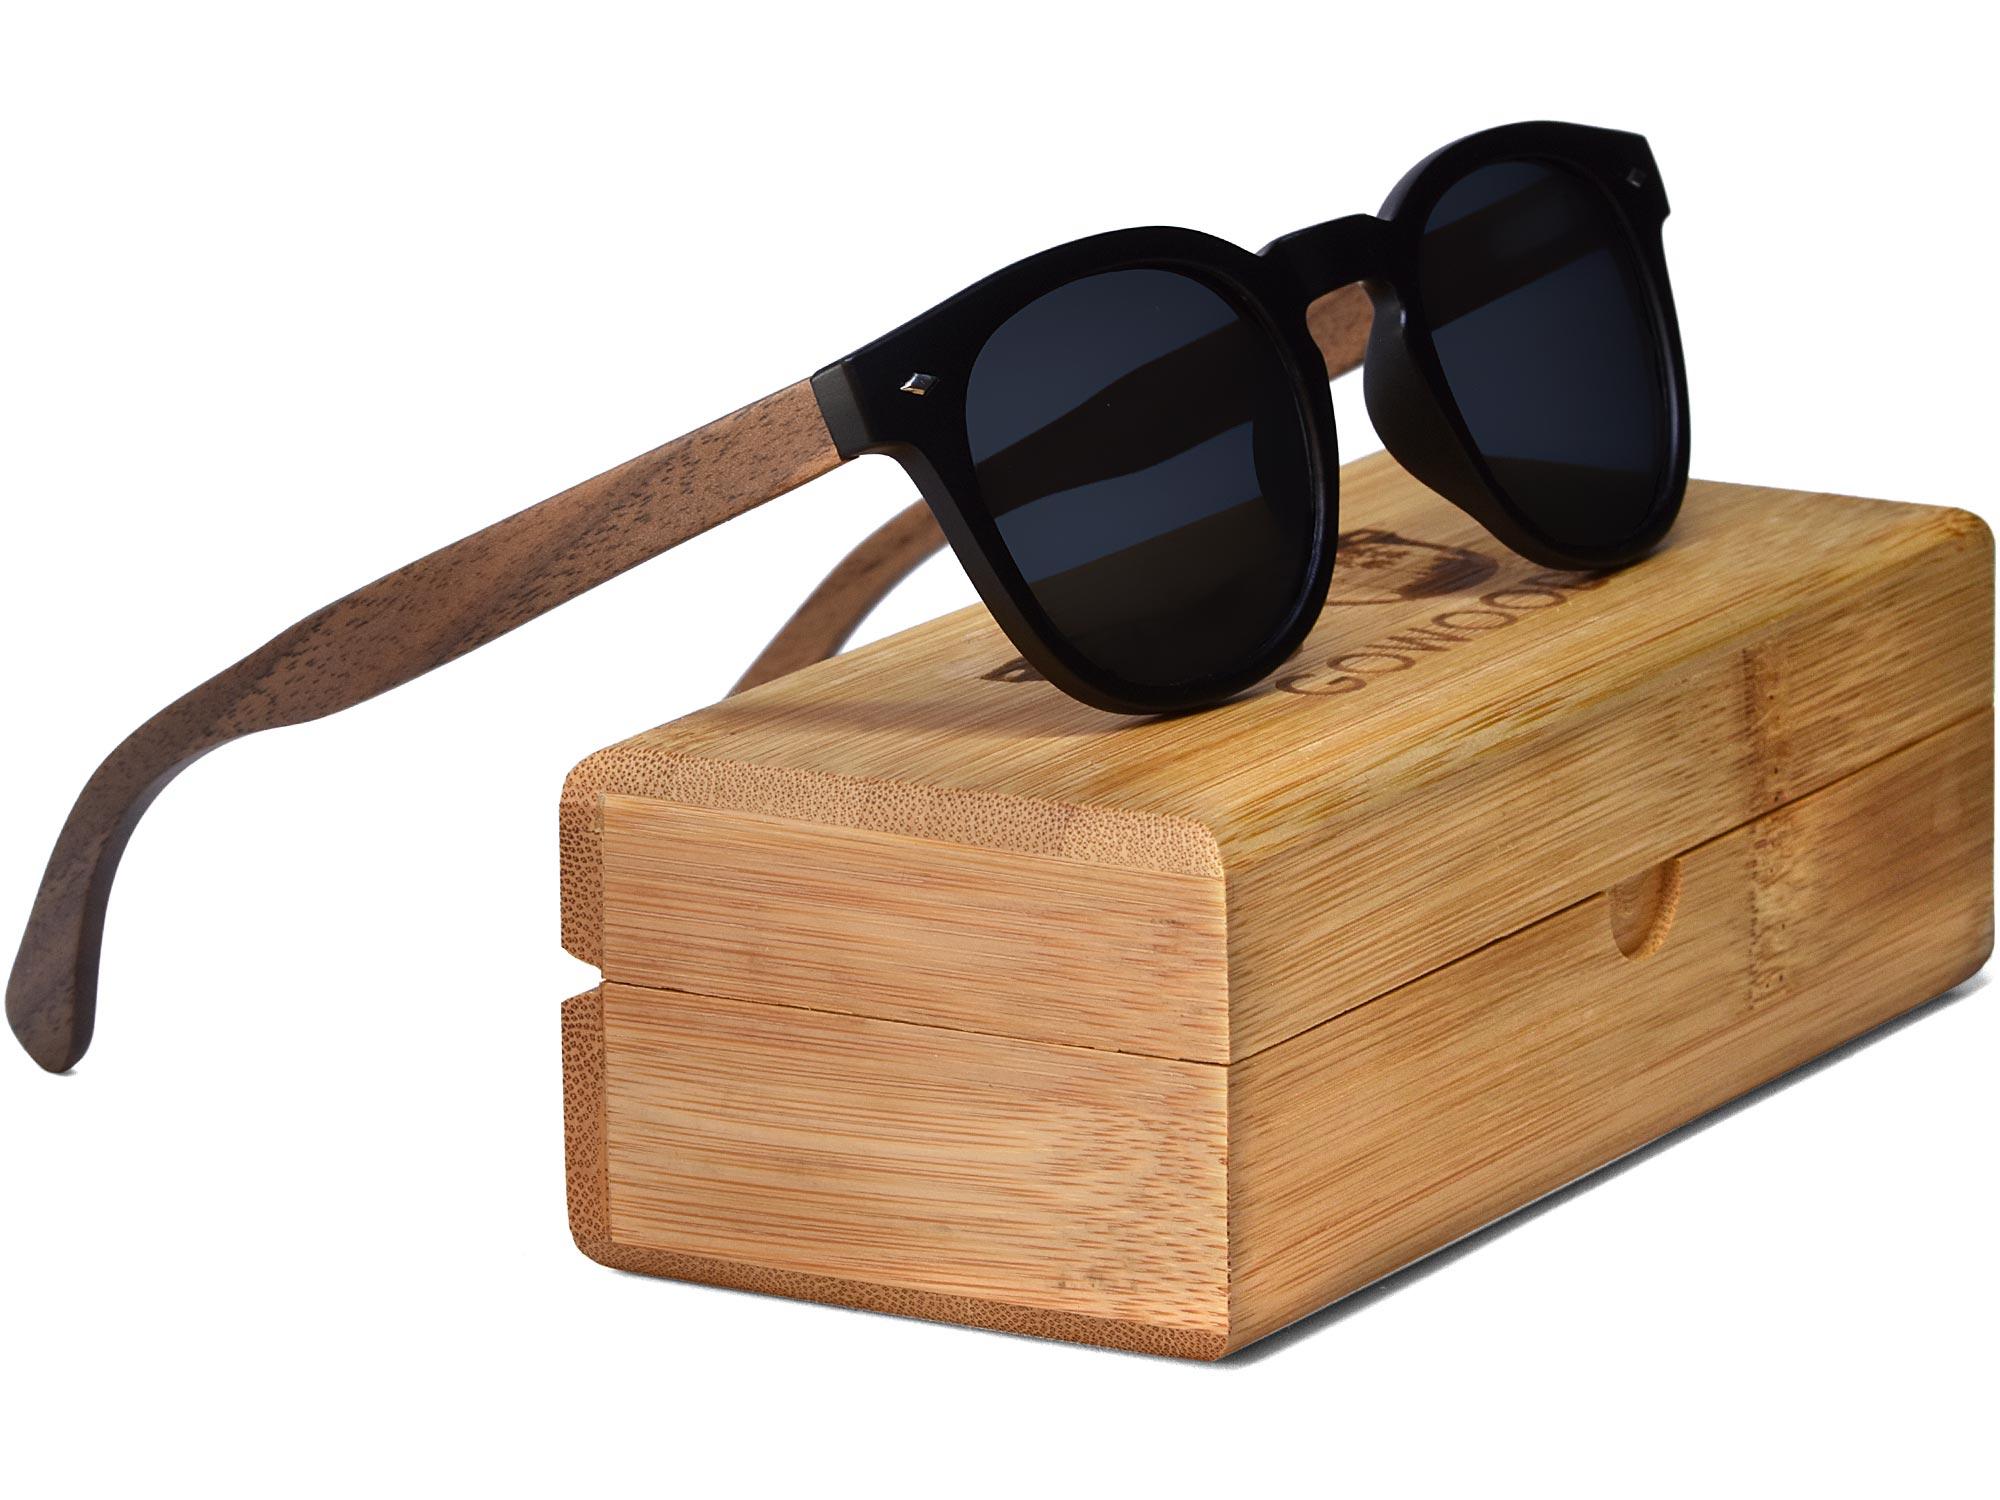 Round walnut wood sunglasses set